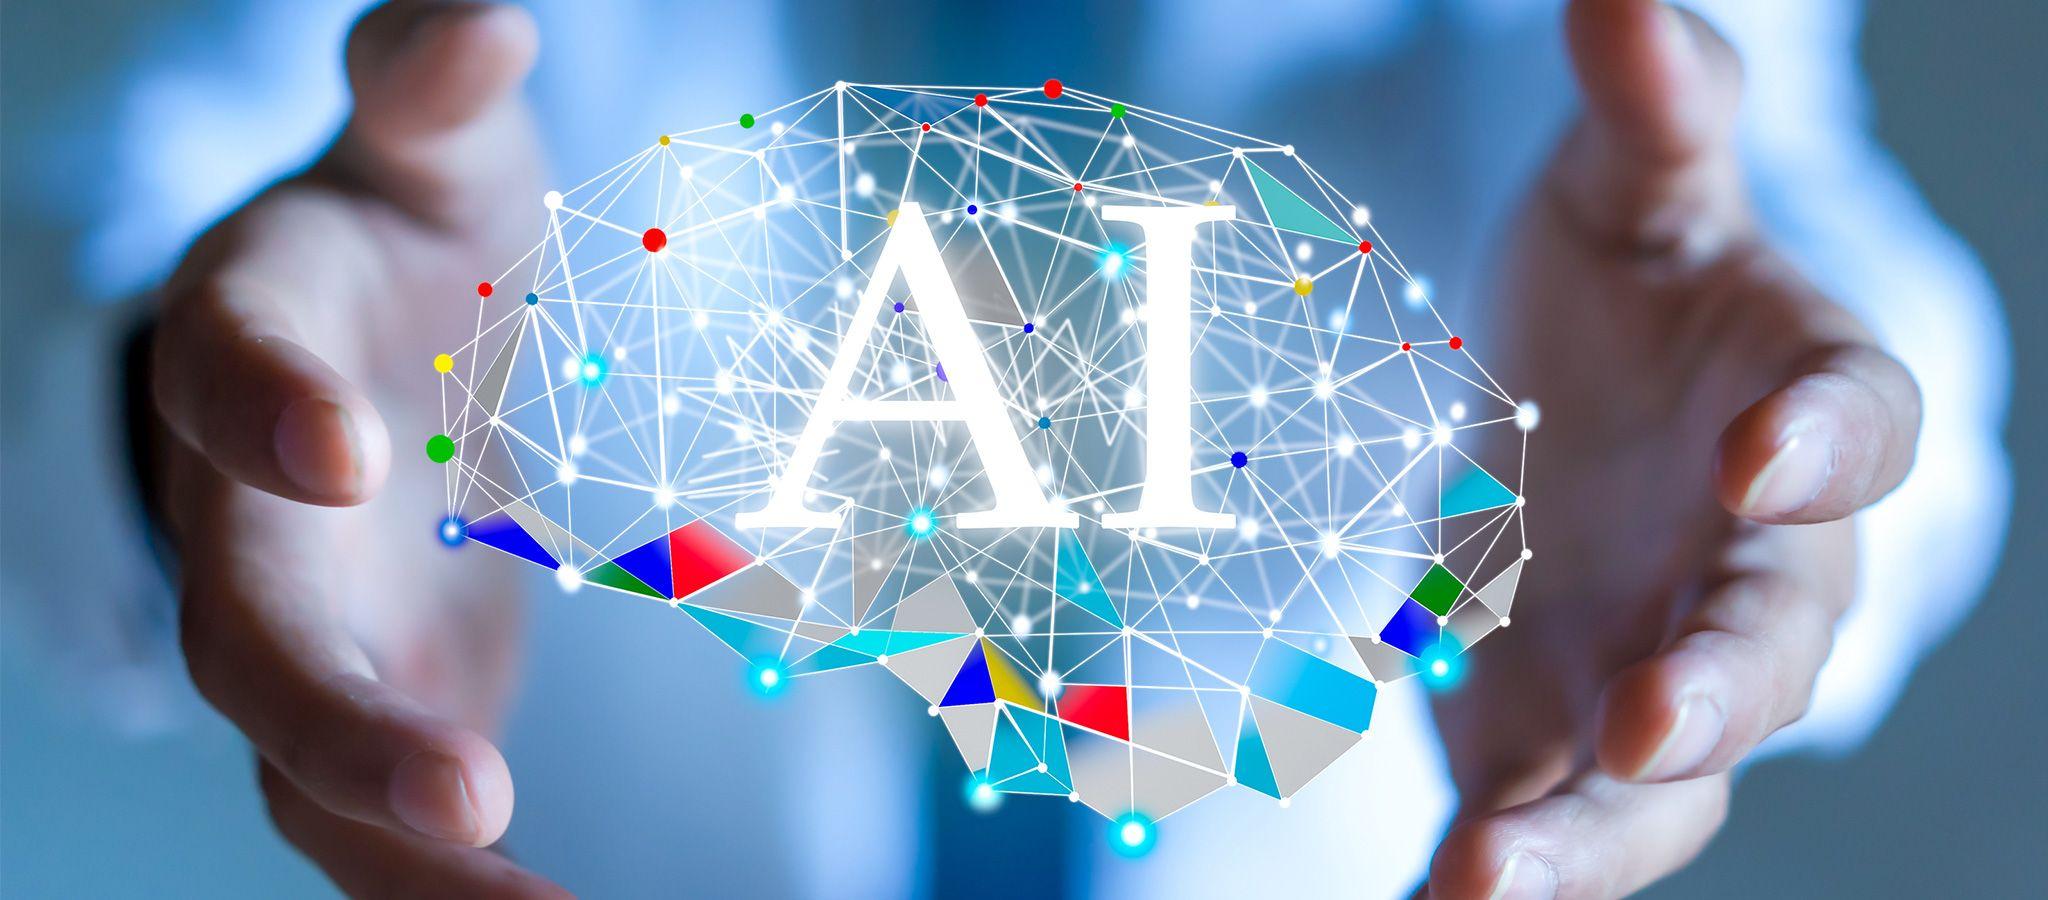 関西学院「AI活用人材育成」授業に学生殺到の訳